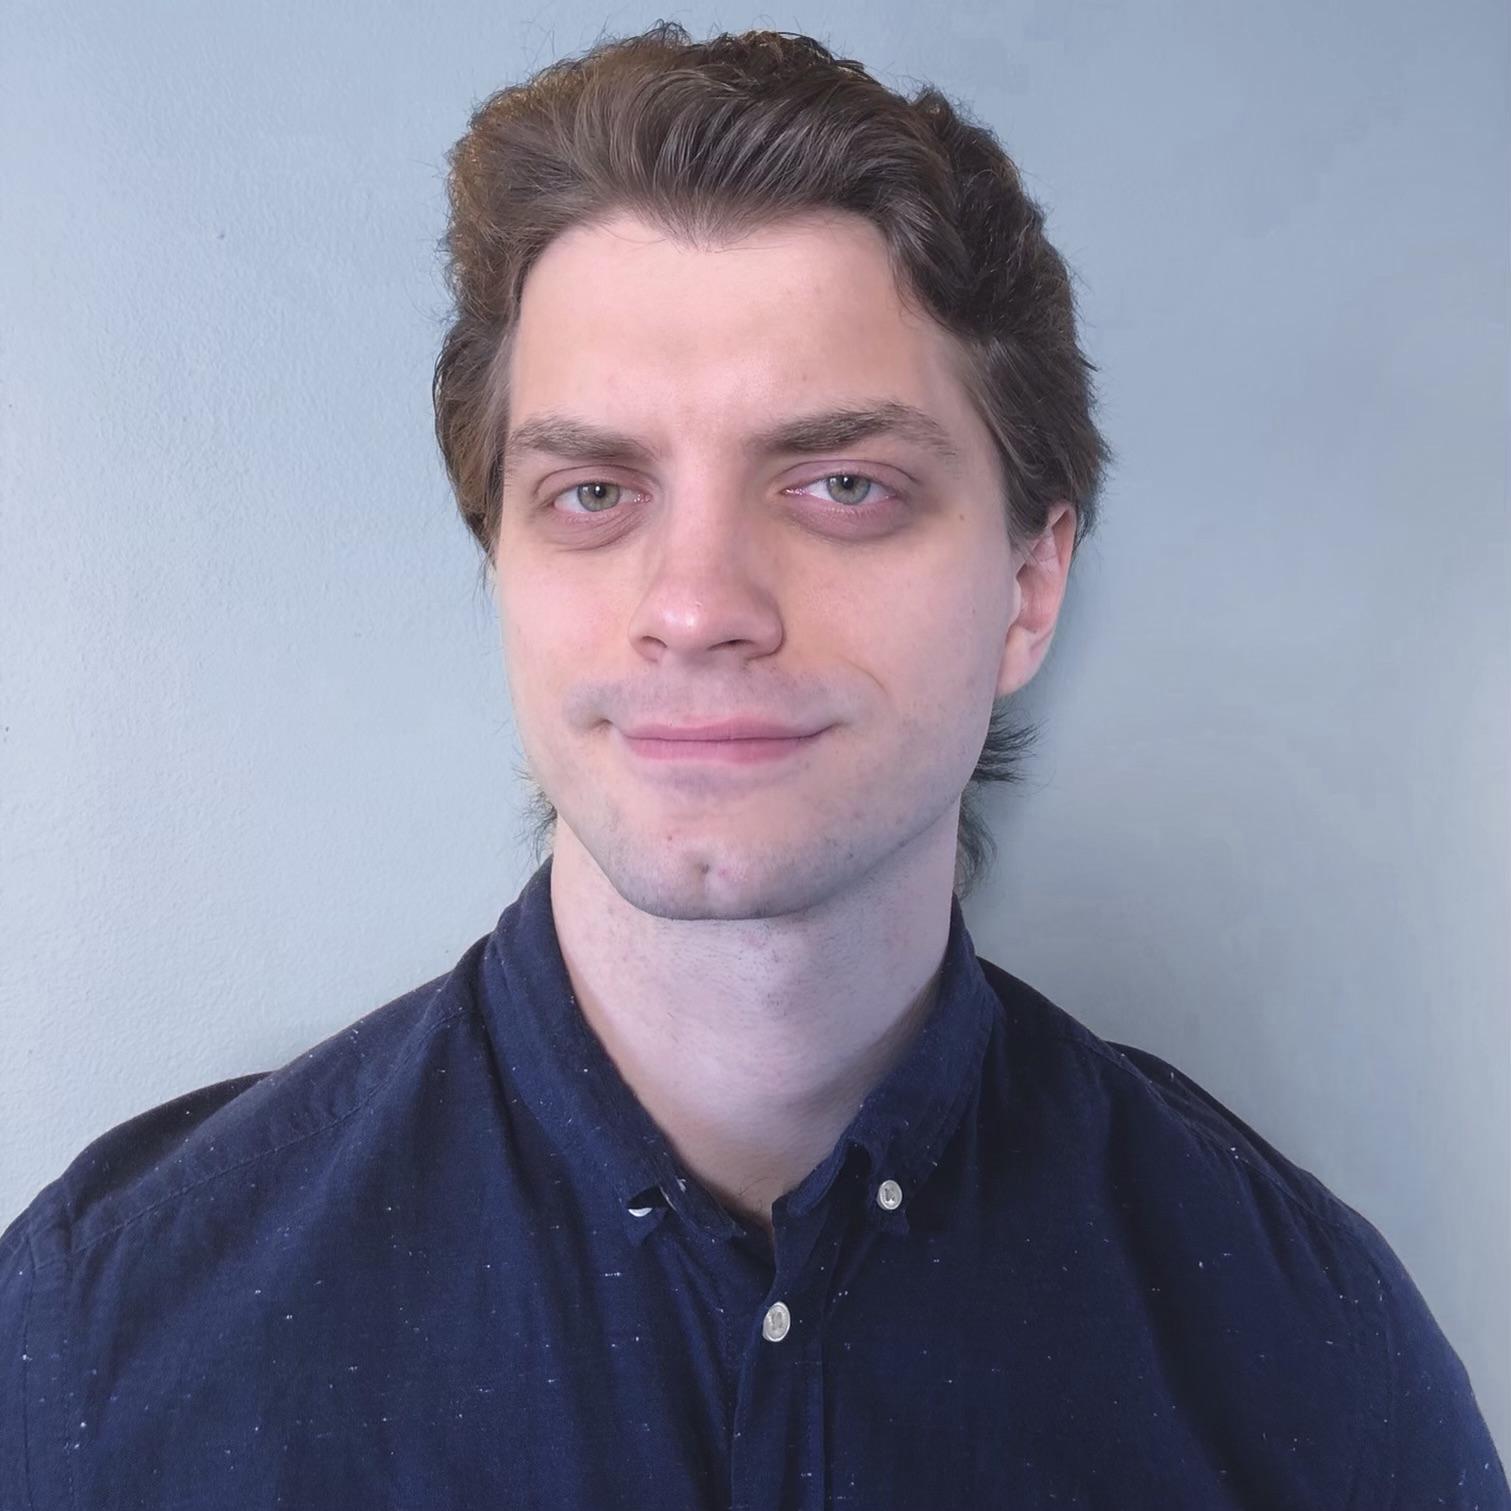 Aetna-covered therapist Adrian Kwiatkowski